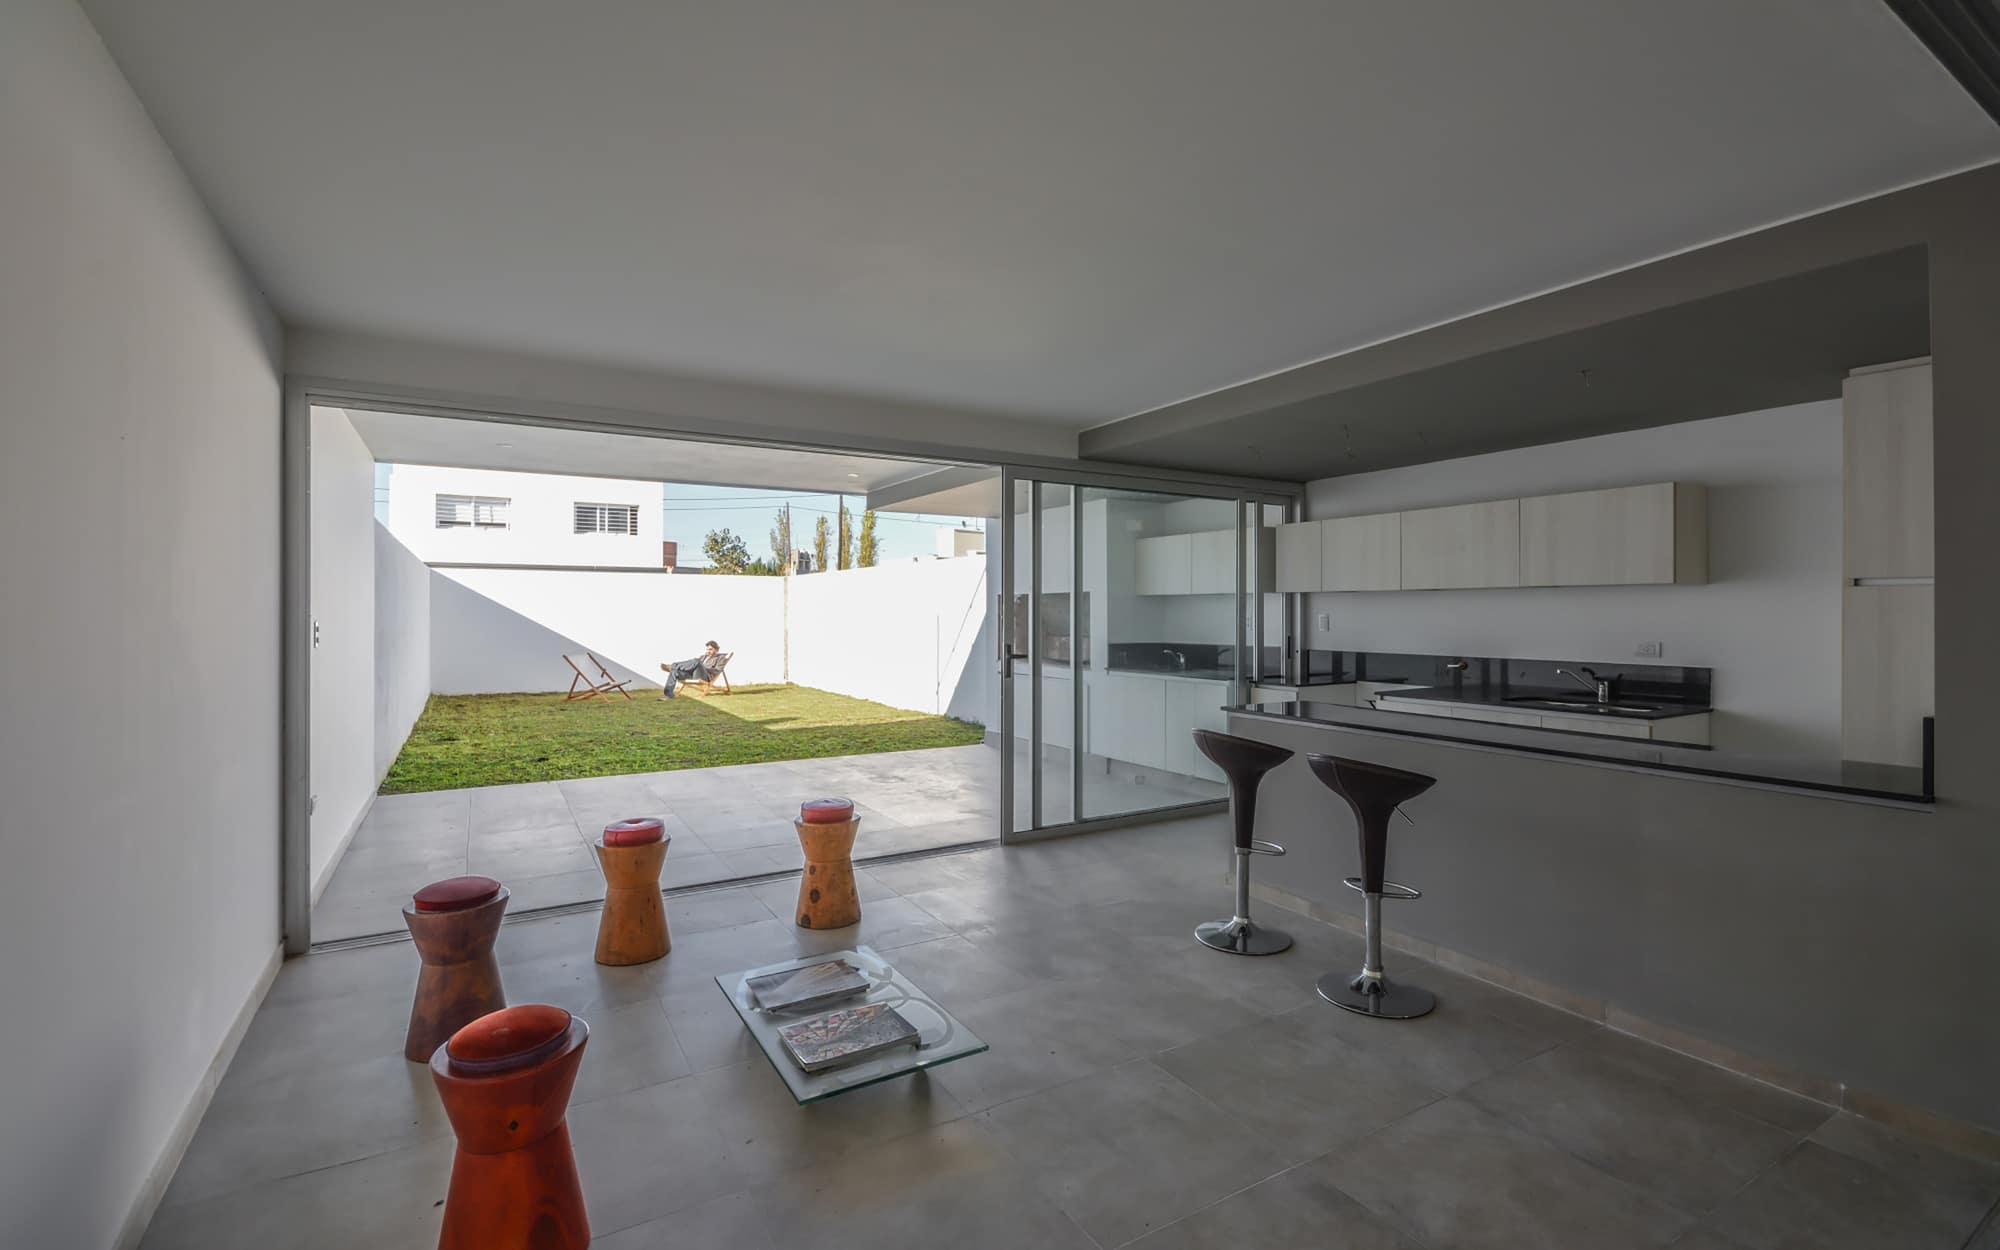 Dise o de cocina sencilla color gris construye hogar for Plano de cocina sencilla